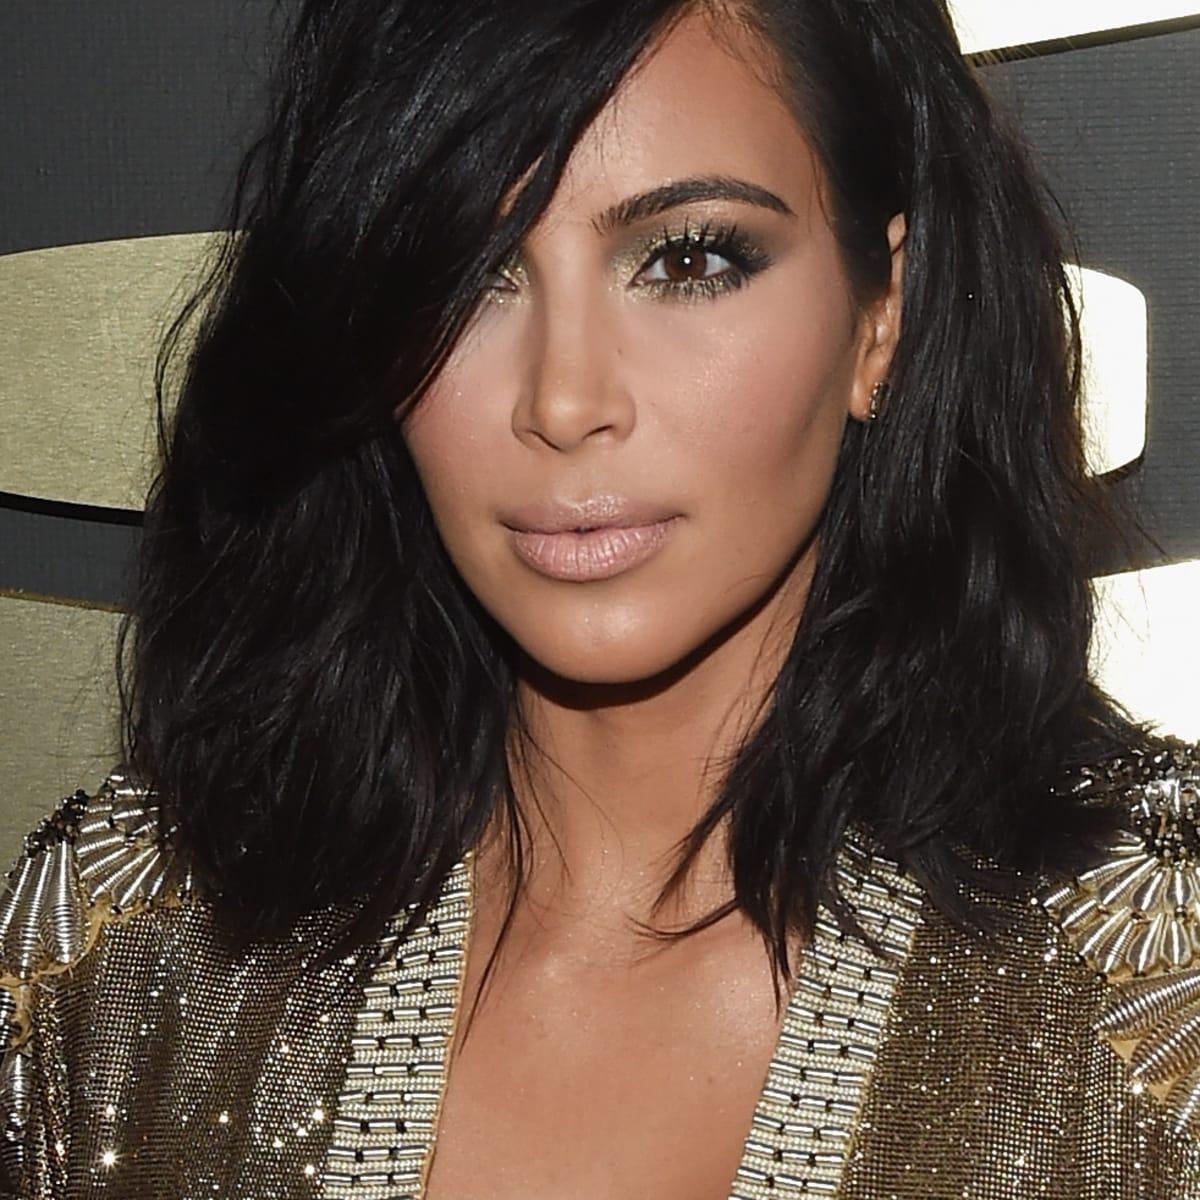 Kim Kardashian S Hair Stylist Tells Us About That New Short Cut Fashionista